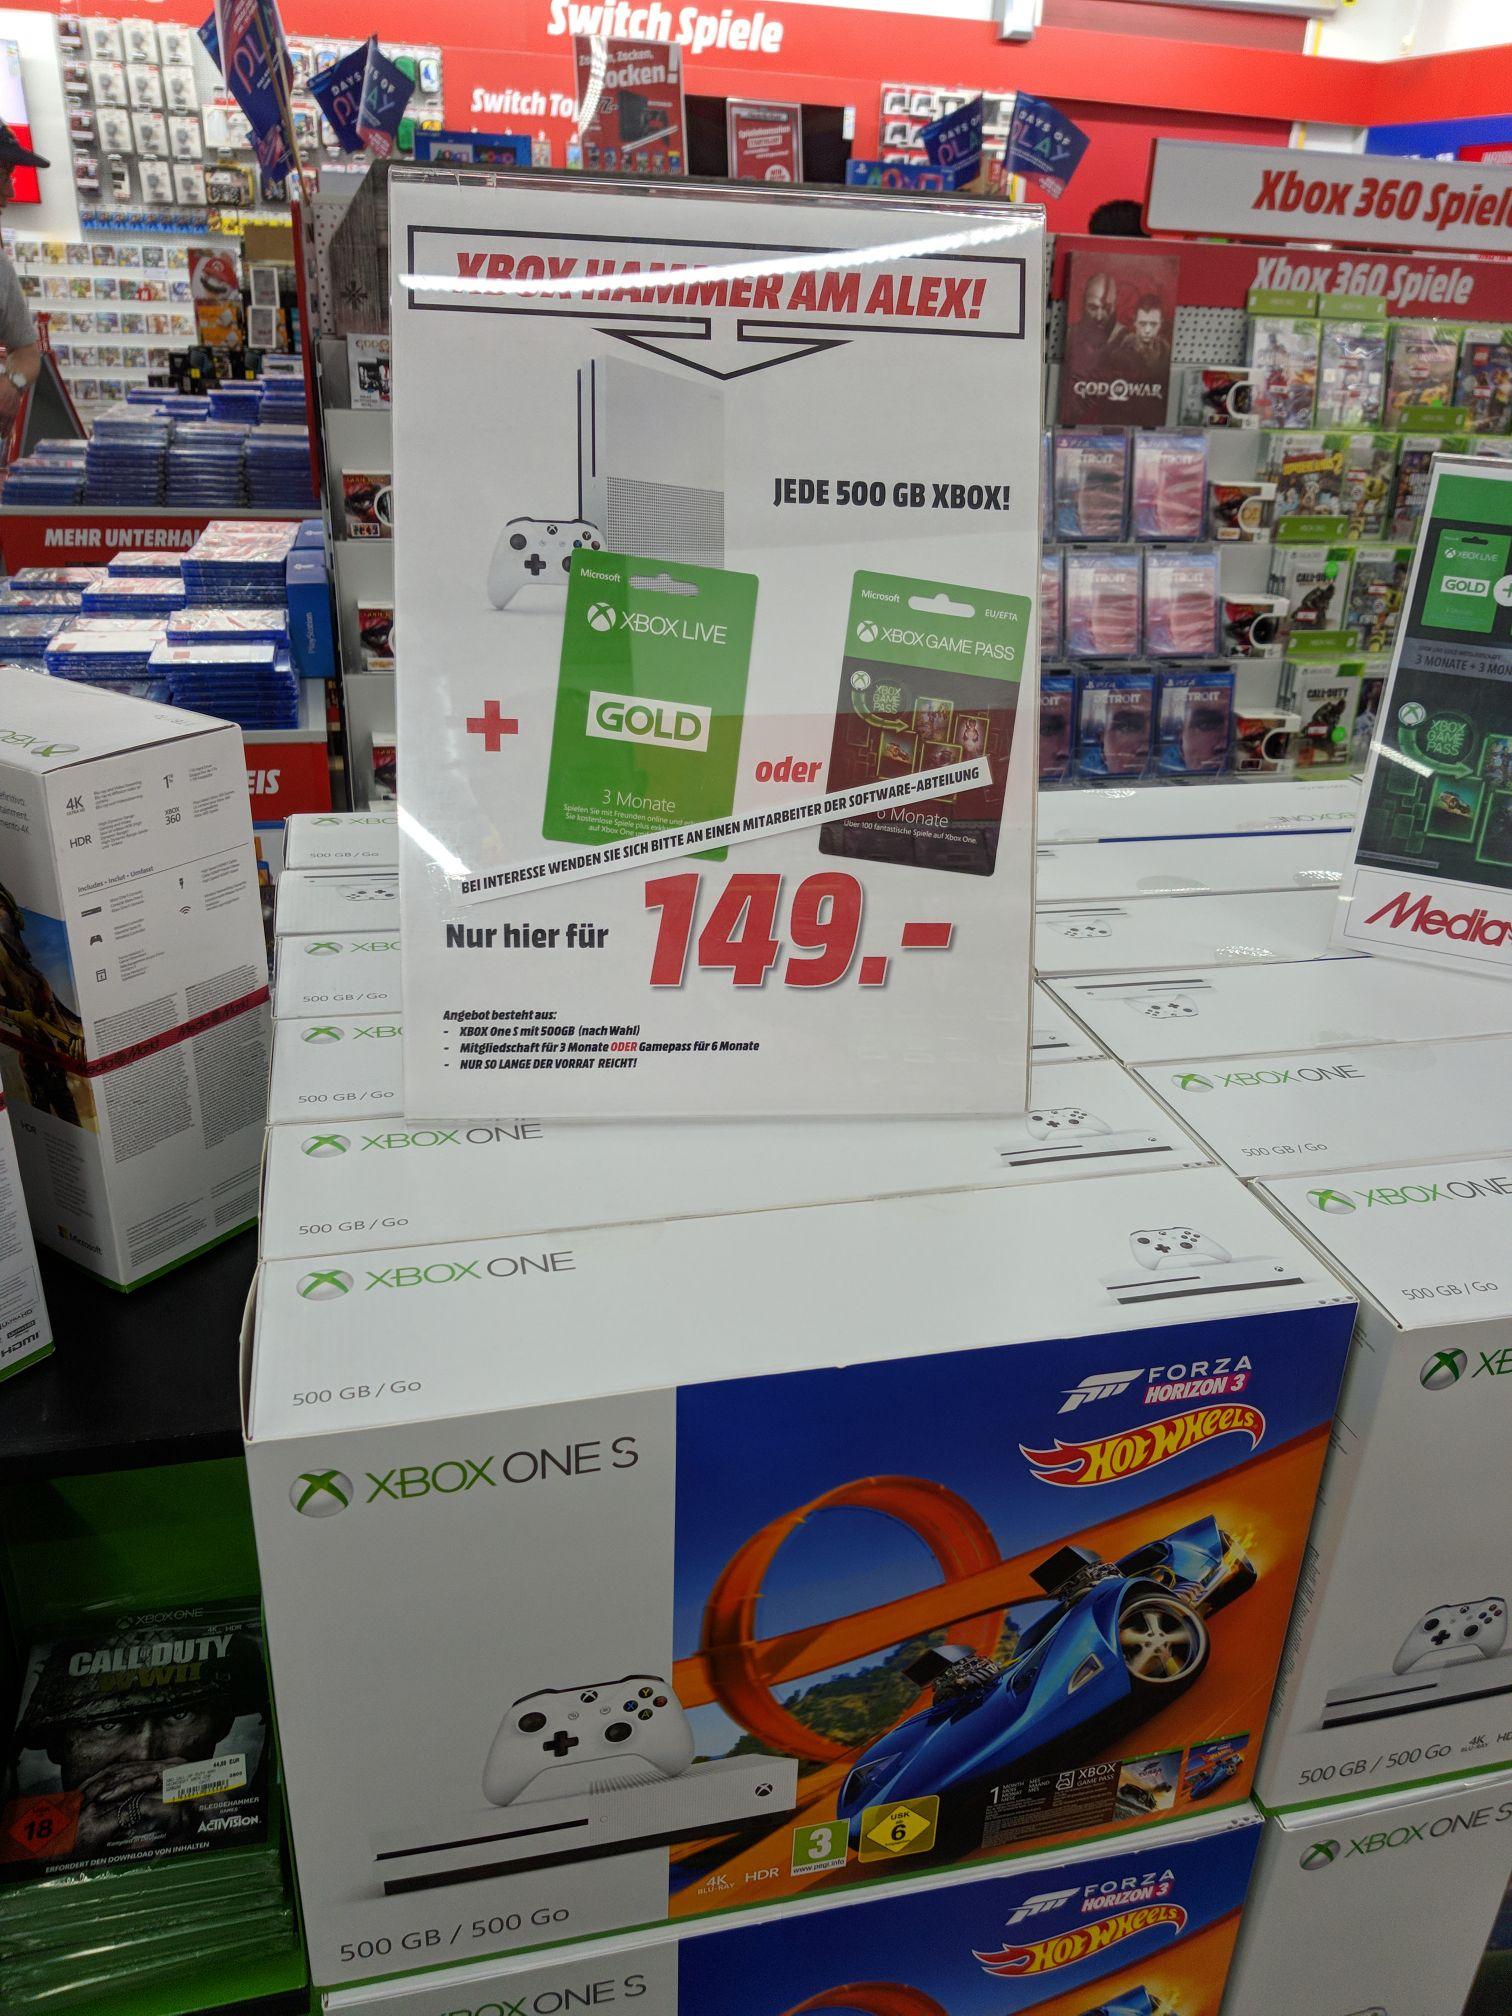 Xbox one s + 3 Monate gold oder 6 Monate gamepass + Spiel Berlin Alexa Media Markt